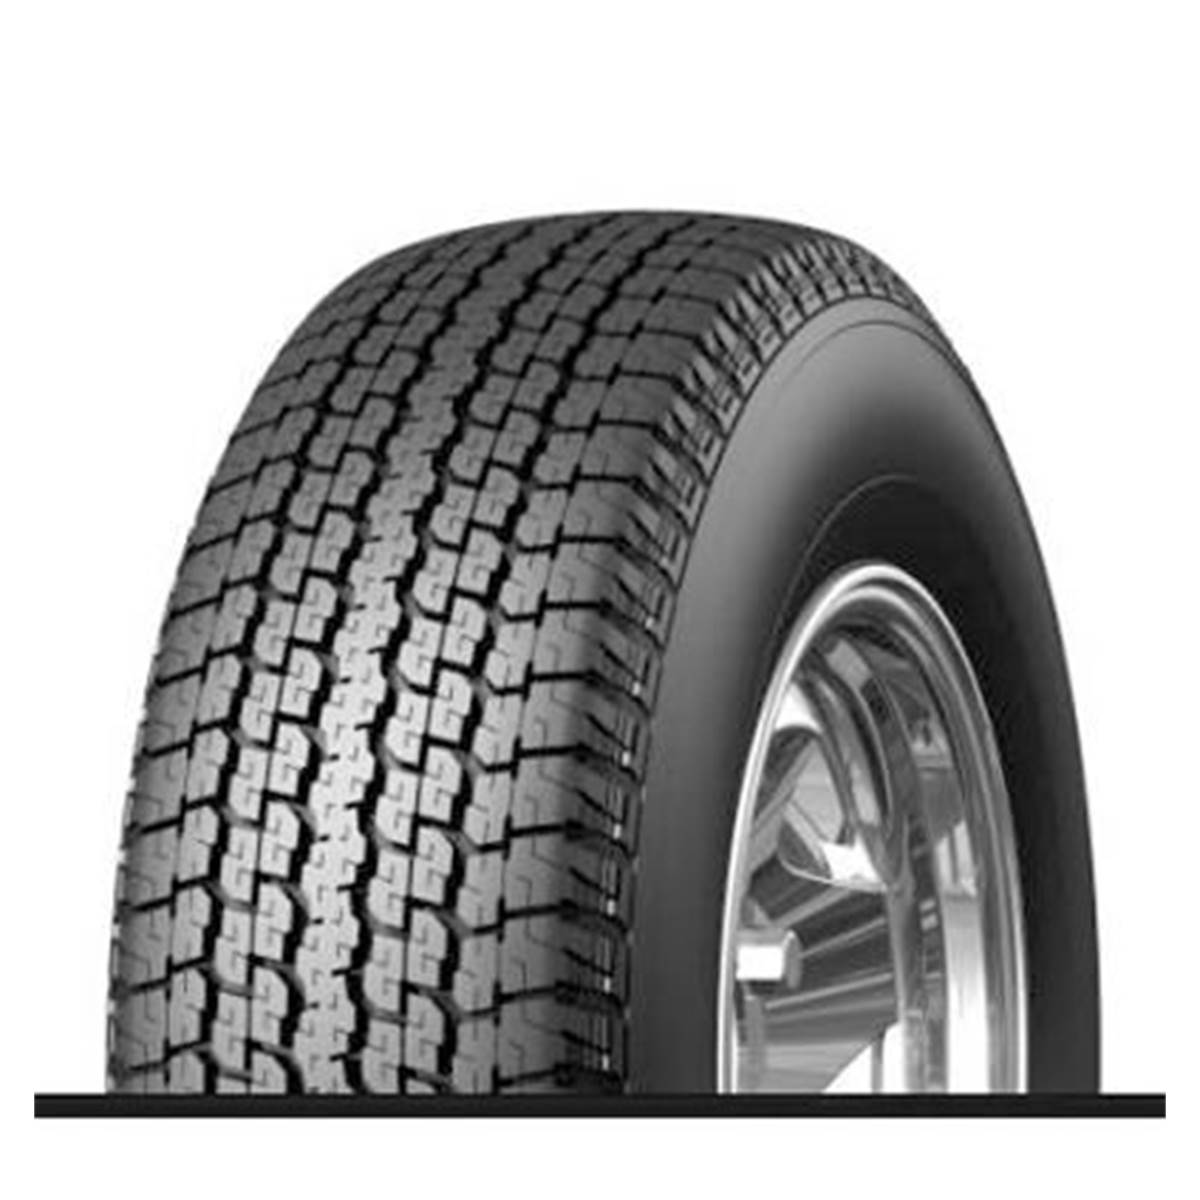 Pneu Bridgestone 245/75X16 111 S DUELER D840